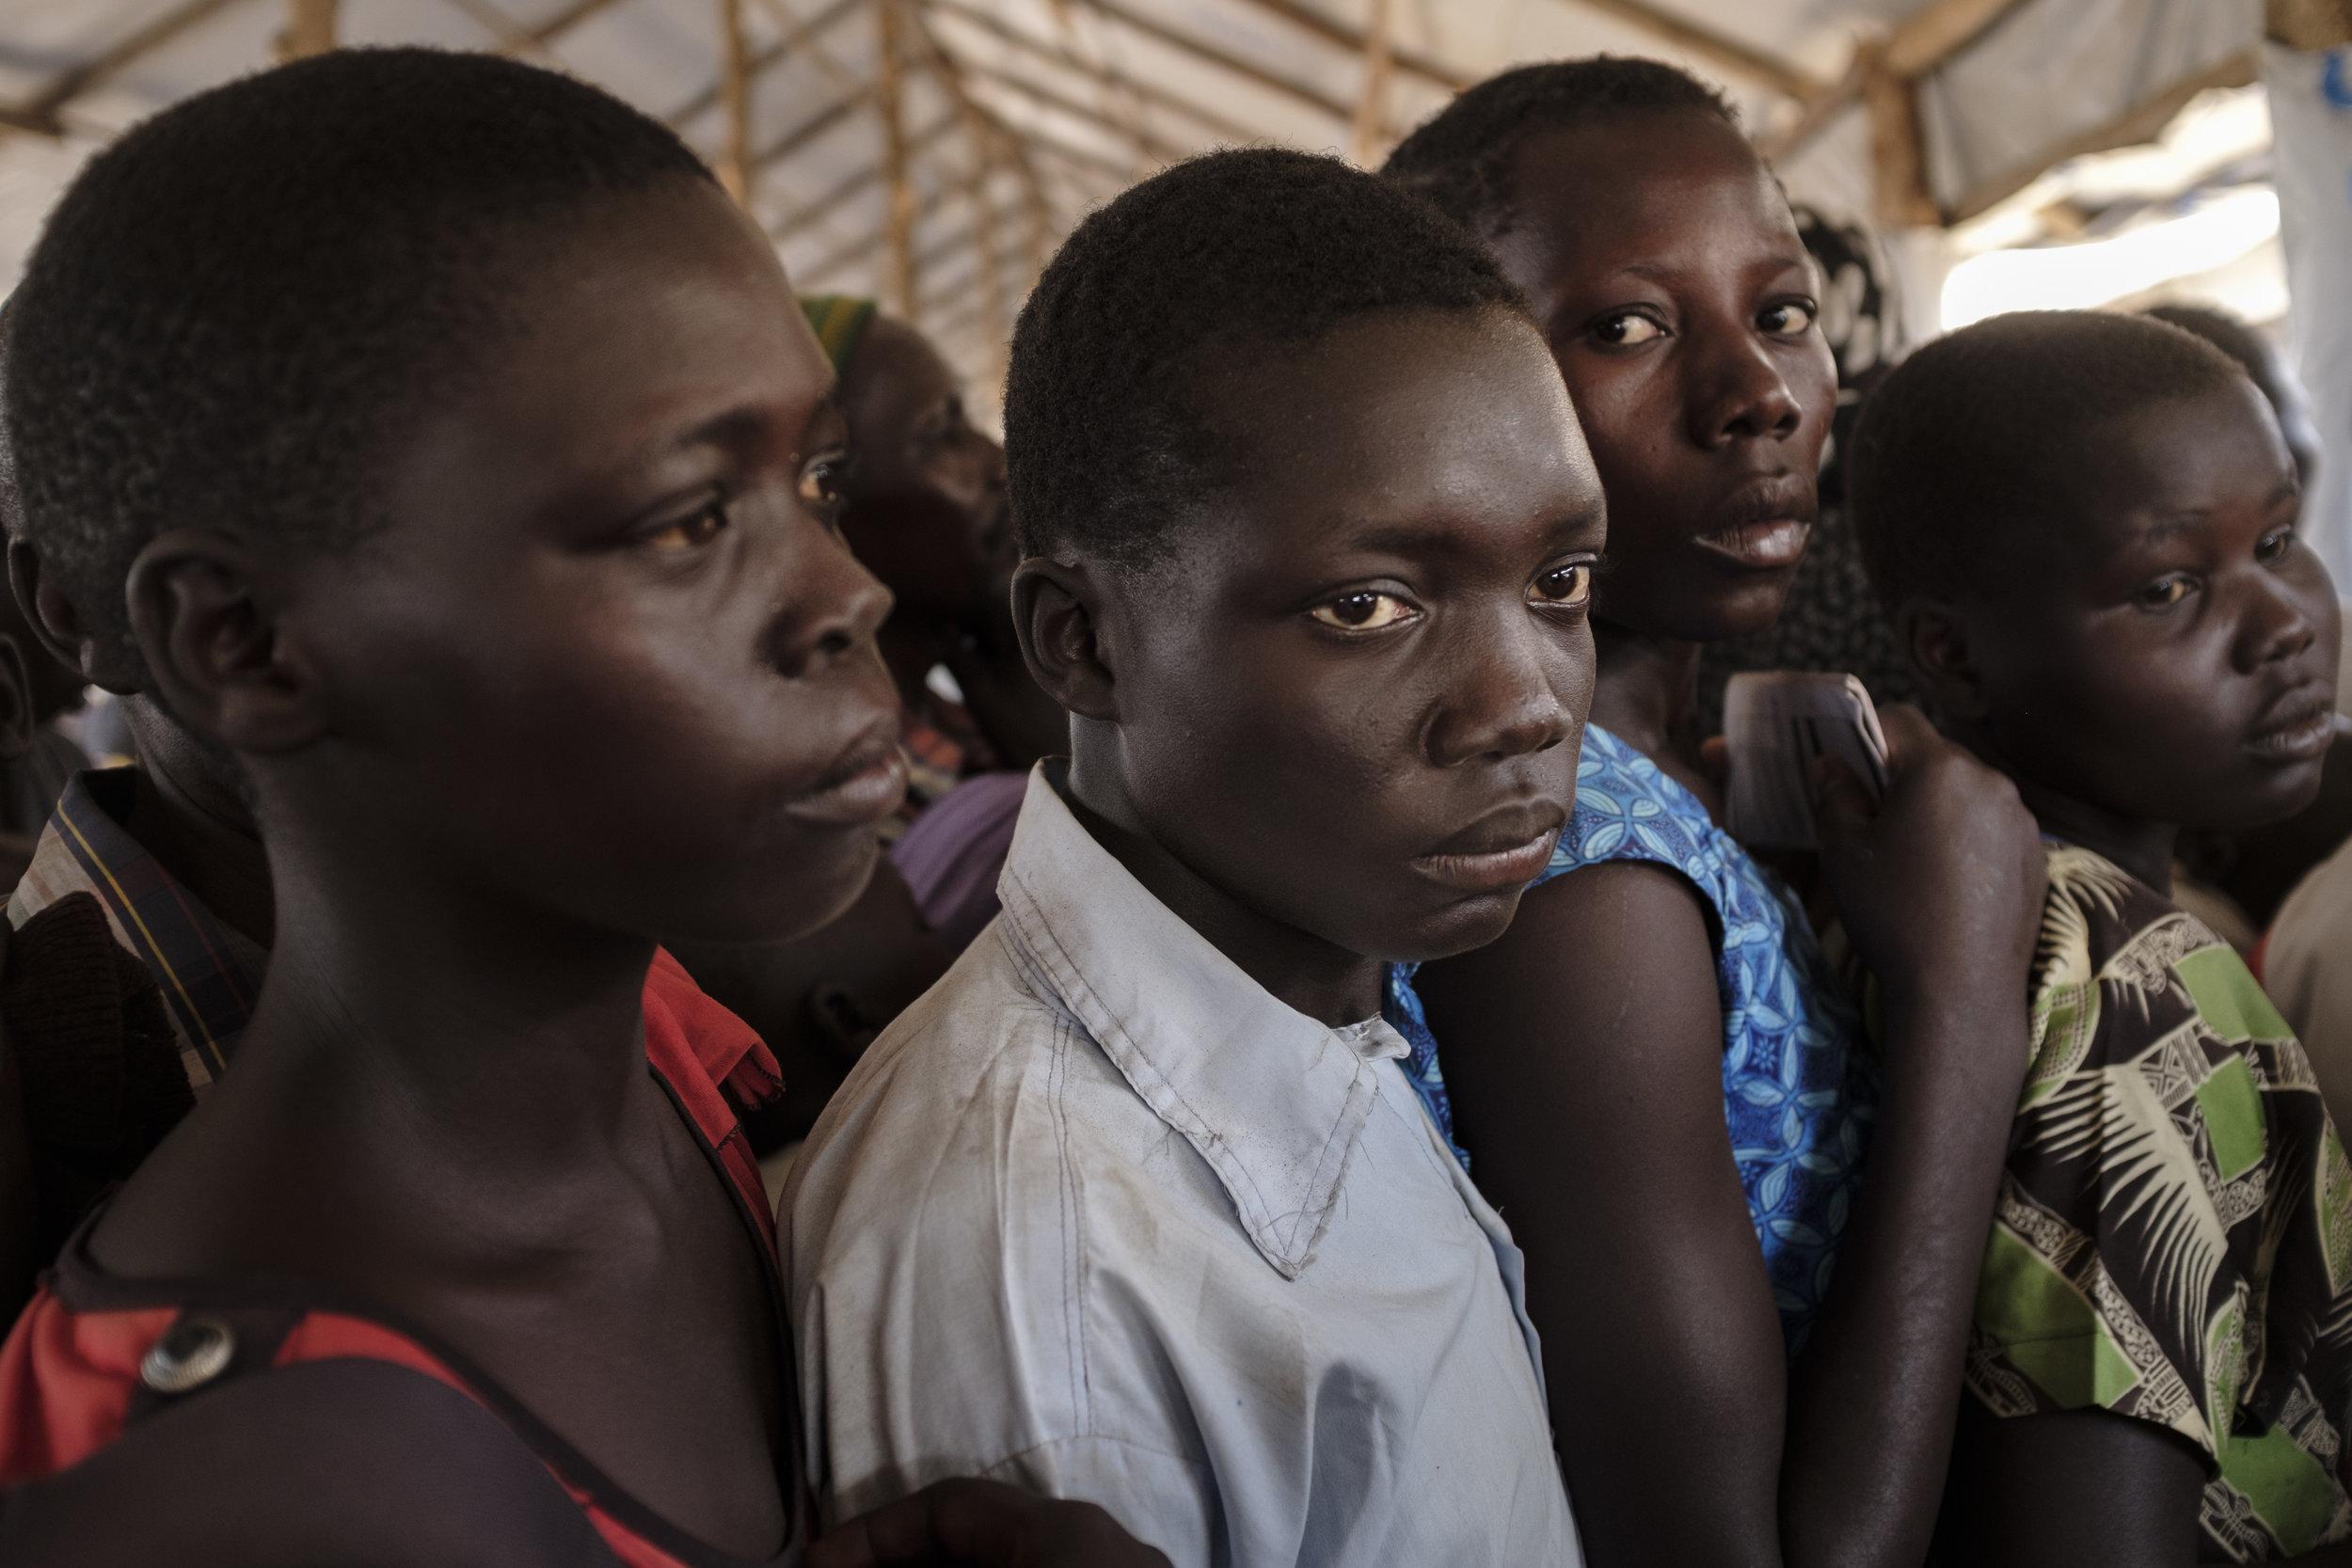 South Sudanese refugees queue to register at the Imvepi Reception Centre, Arua District, Northern Region, Uganda.